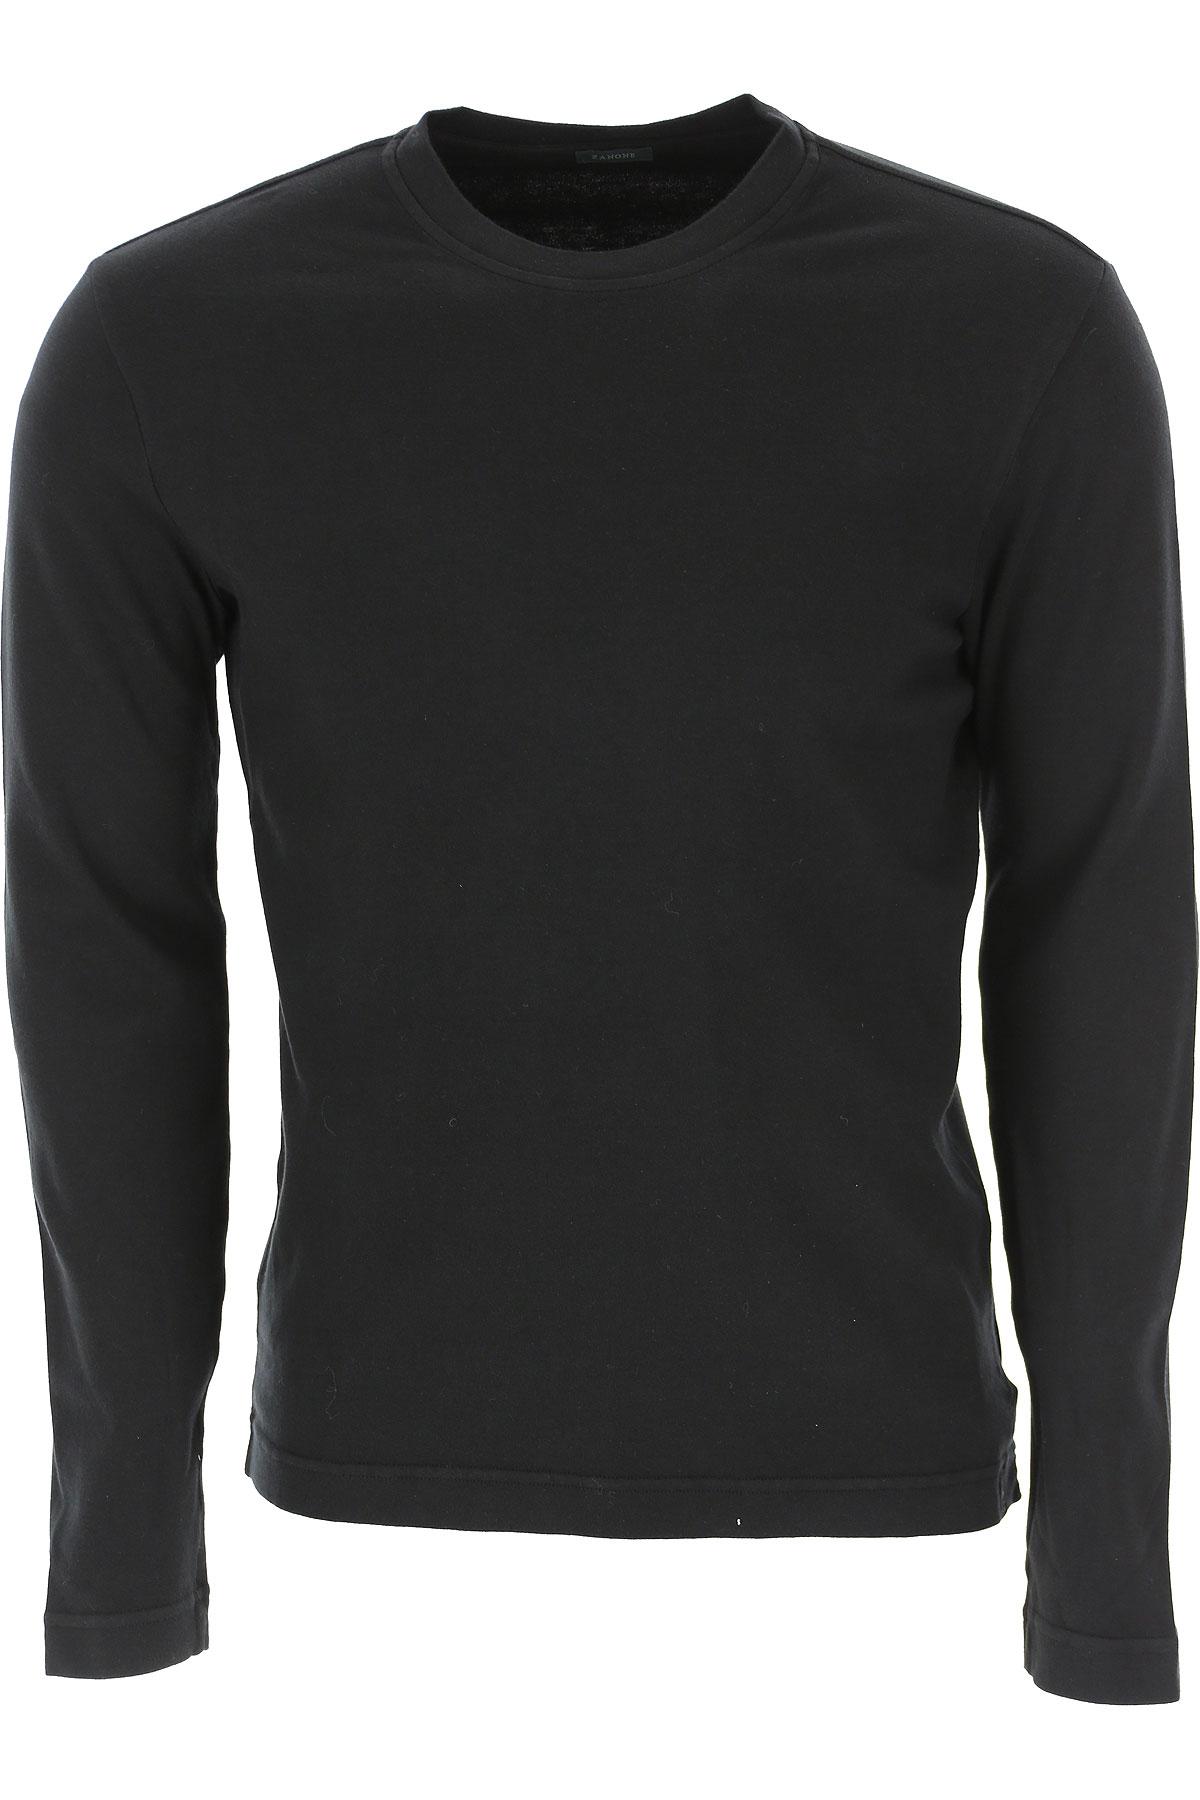 Zanone T-Shirt for Men On Sale, Black, Cotton, 2019, L M XL